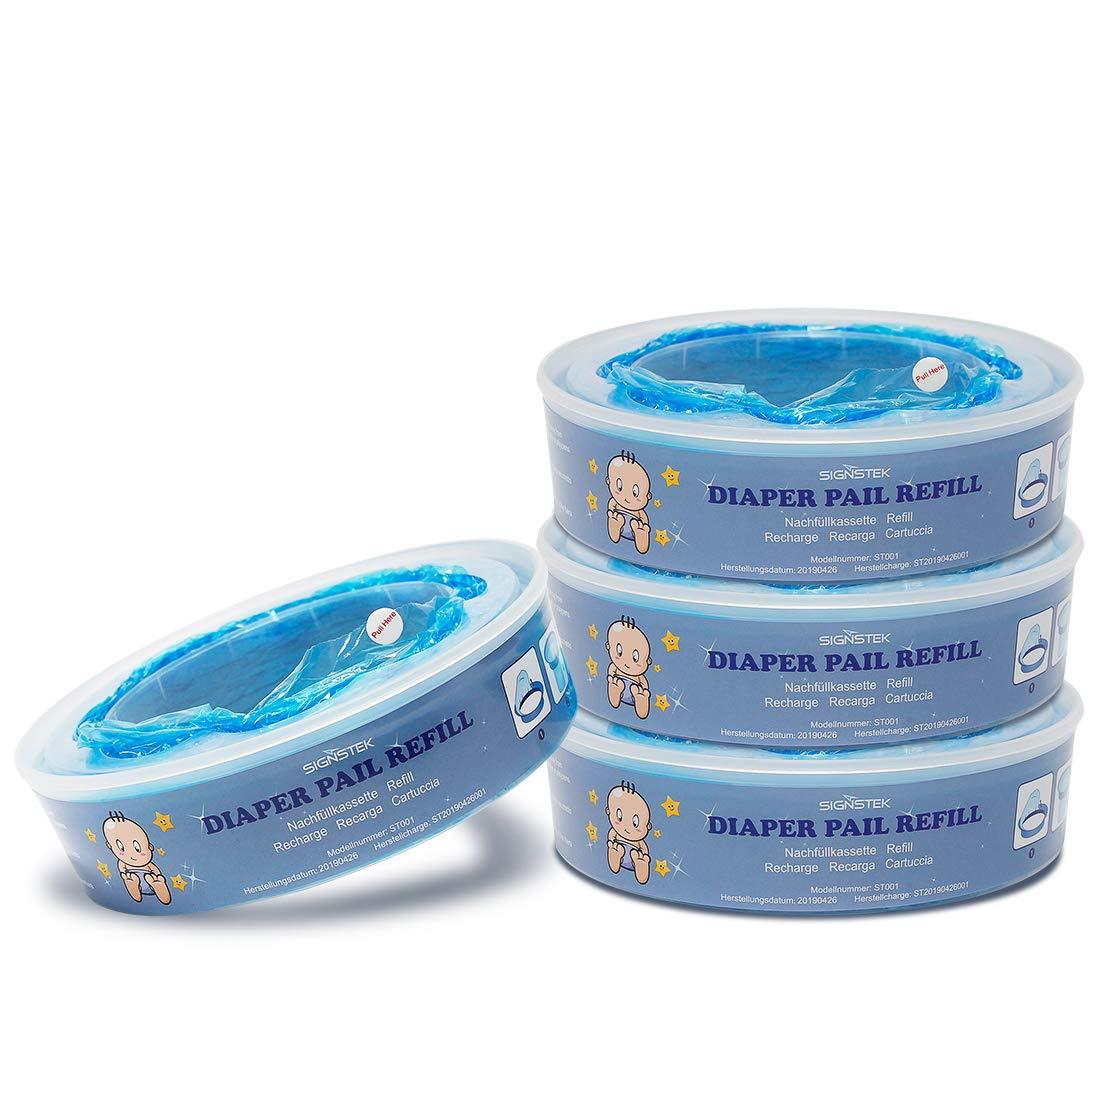 Signstek Diaper Pail Refills Compatible with Diaper Genie Pails,1080 Count, 4-Pack